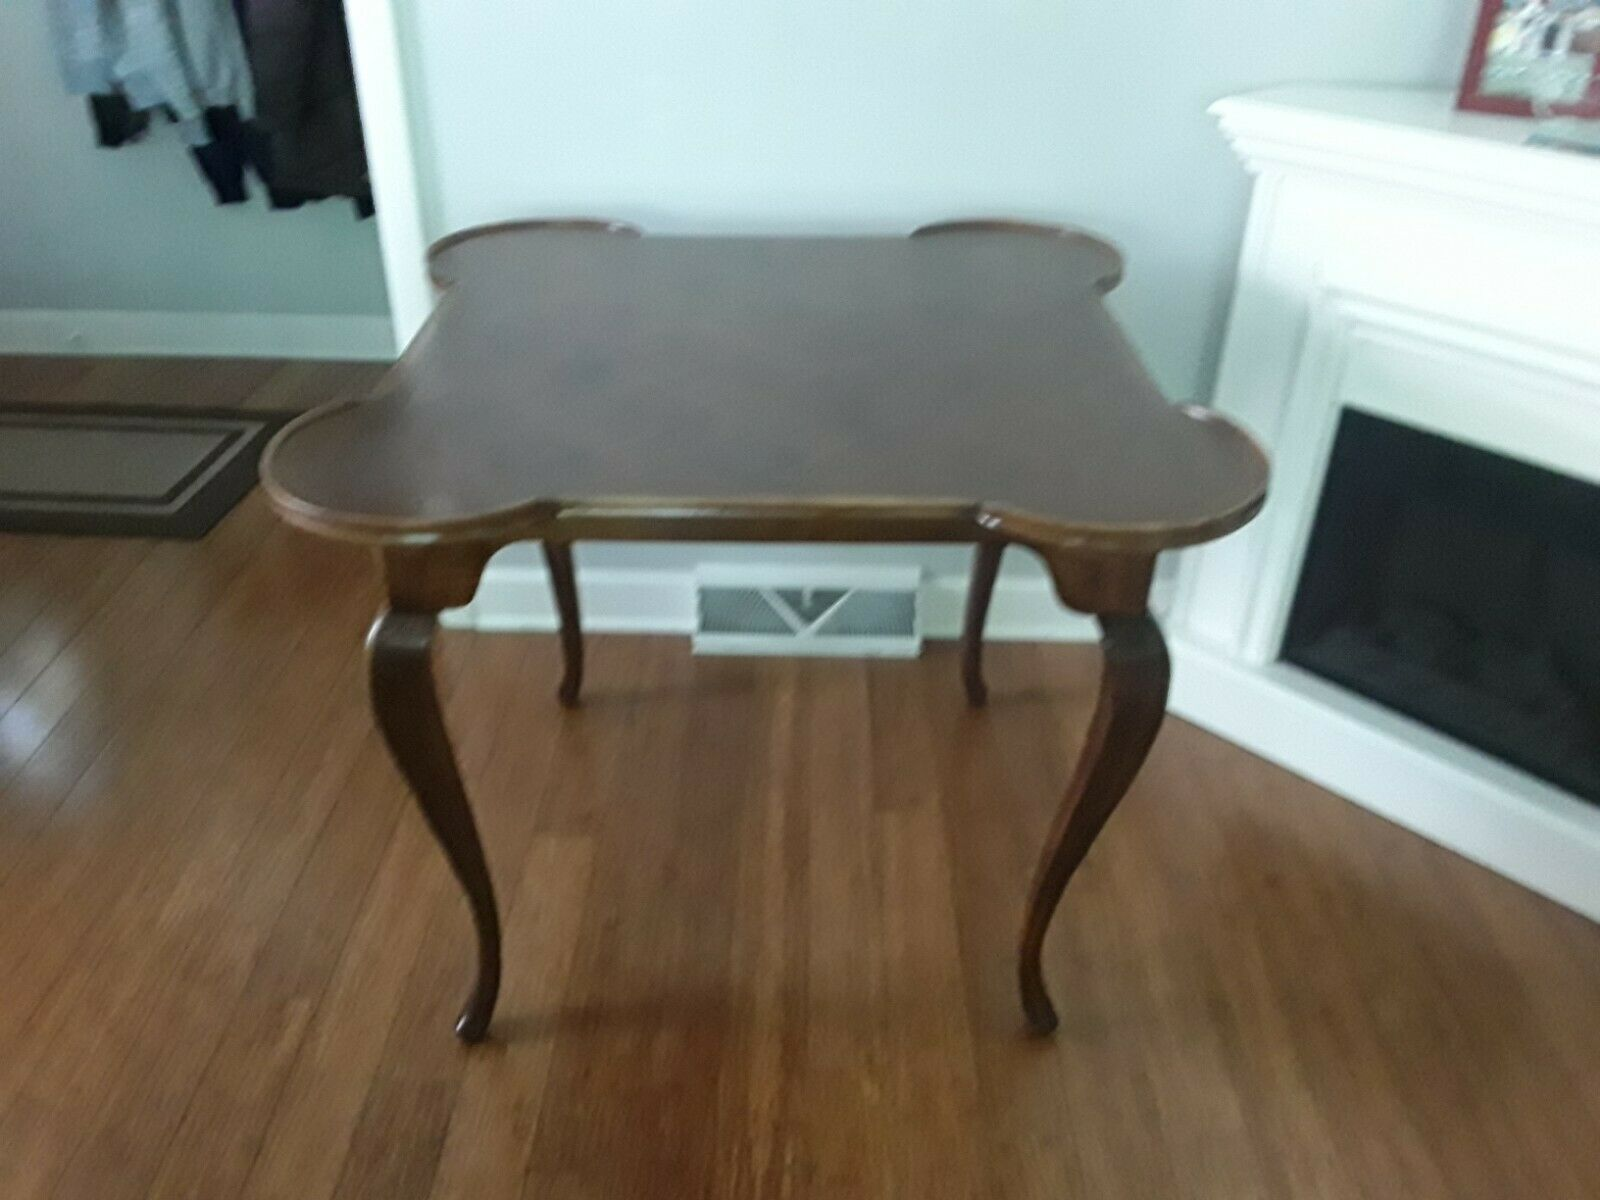 Italian Oak Game Table Wood Parquet Inlay Vintage - $325.00